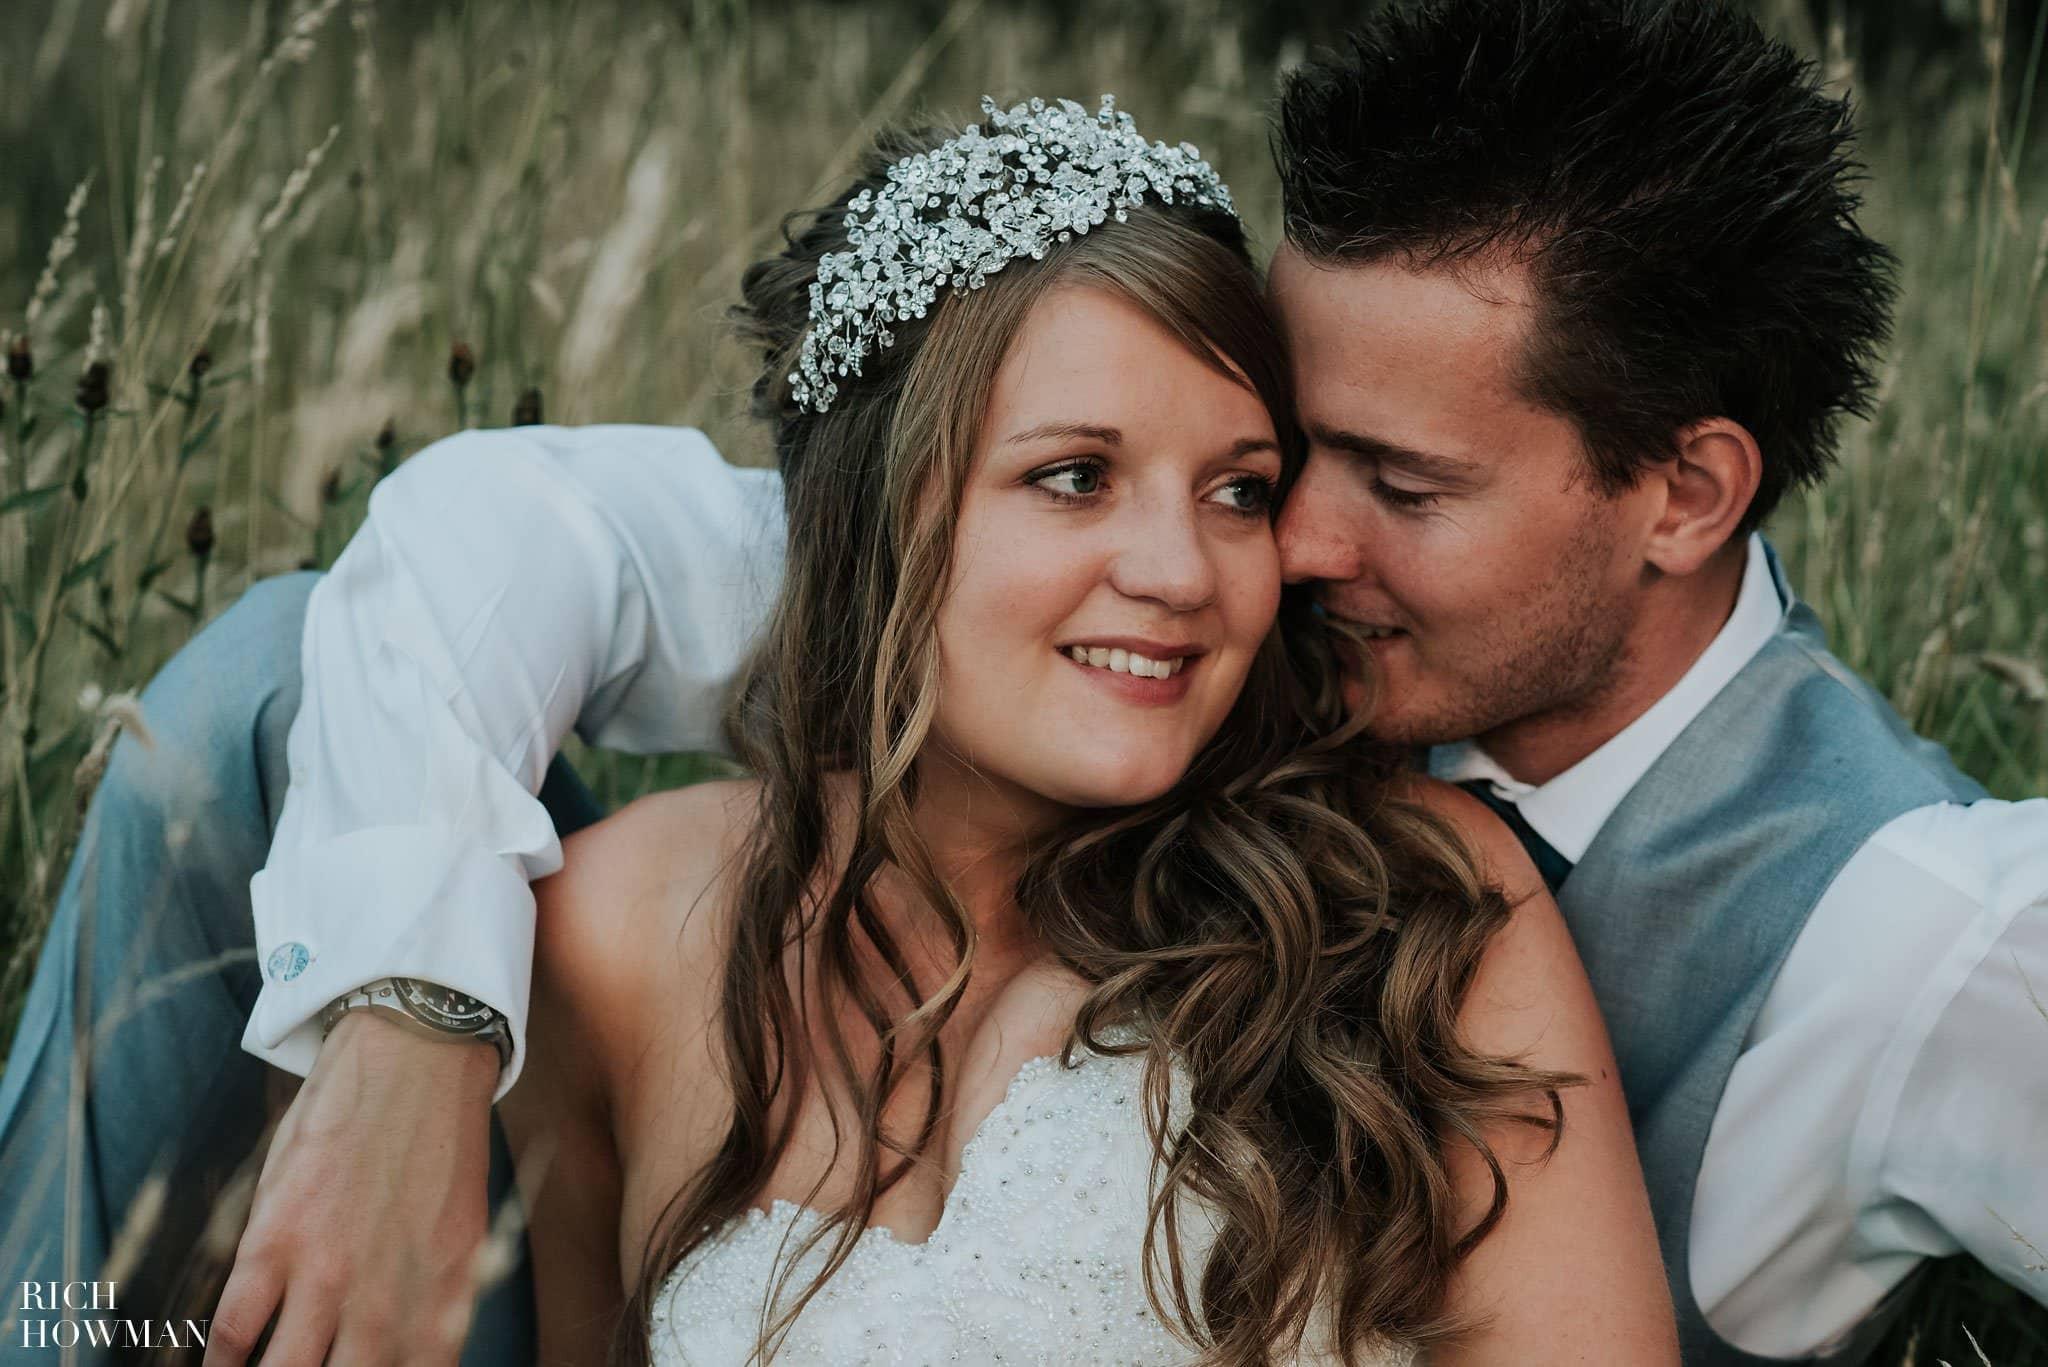 Lacock Wedding & Stanton Manor Wedding Reception | Wedding Photography by Rich Howman 1